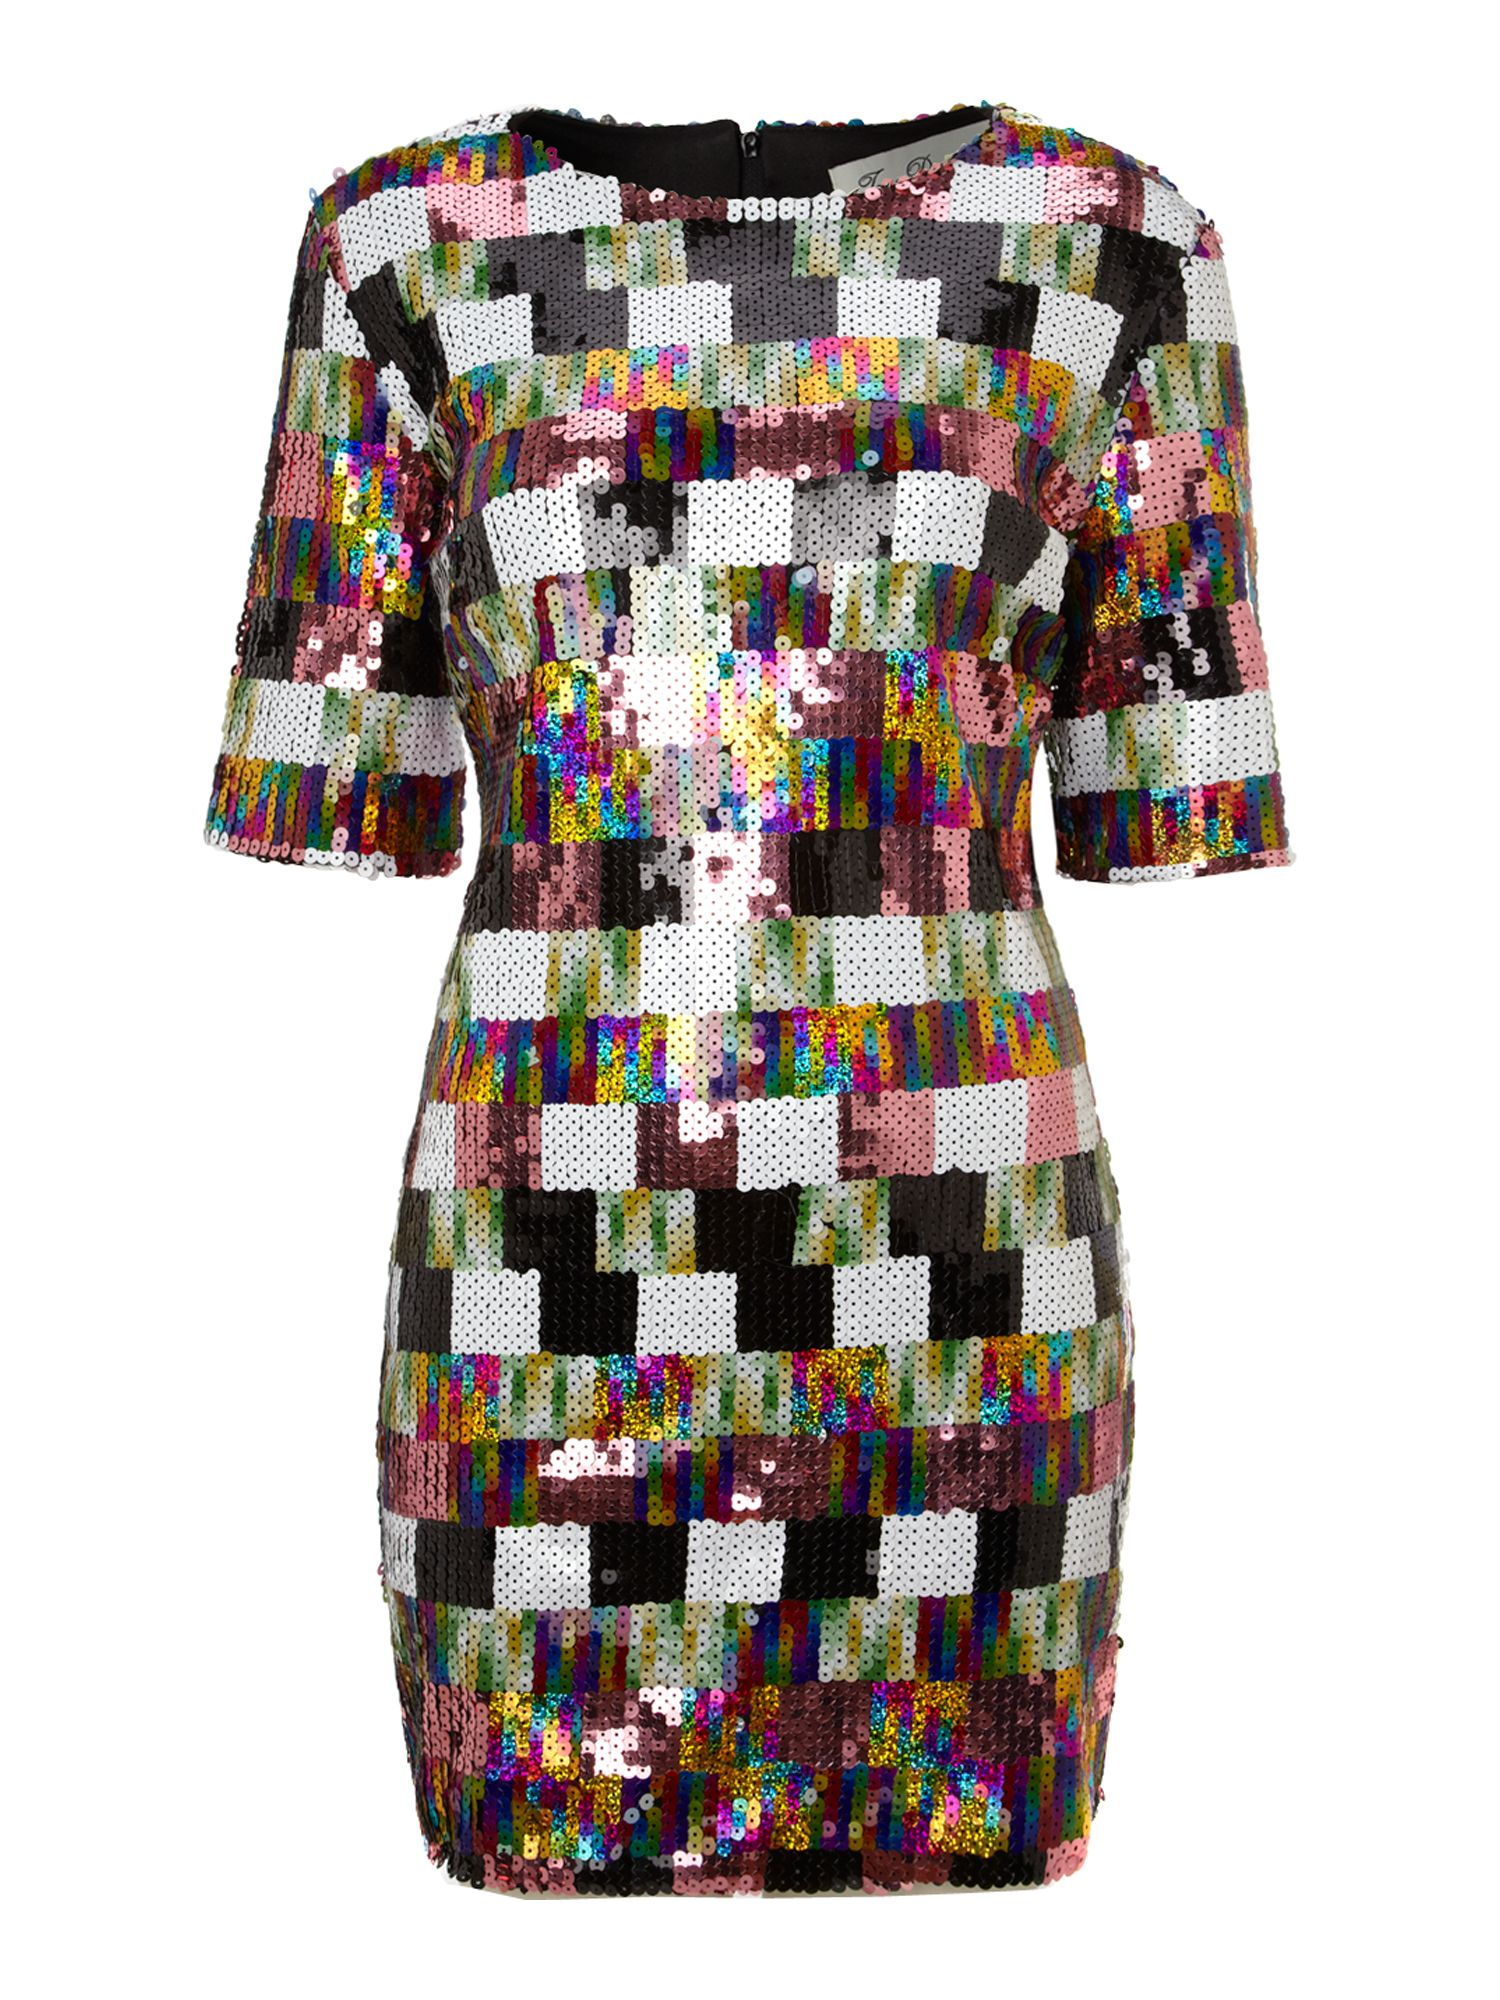 Multi Color Sequin Dress Dress Yp